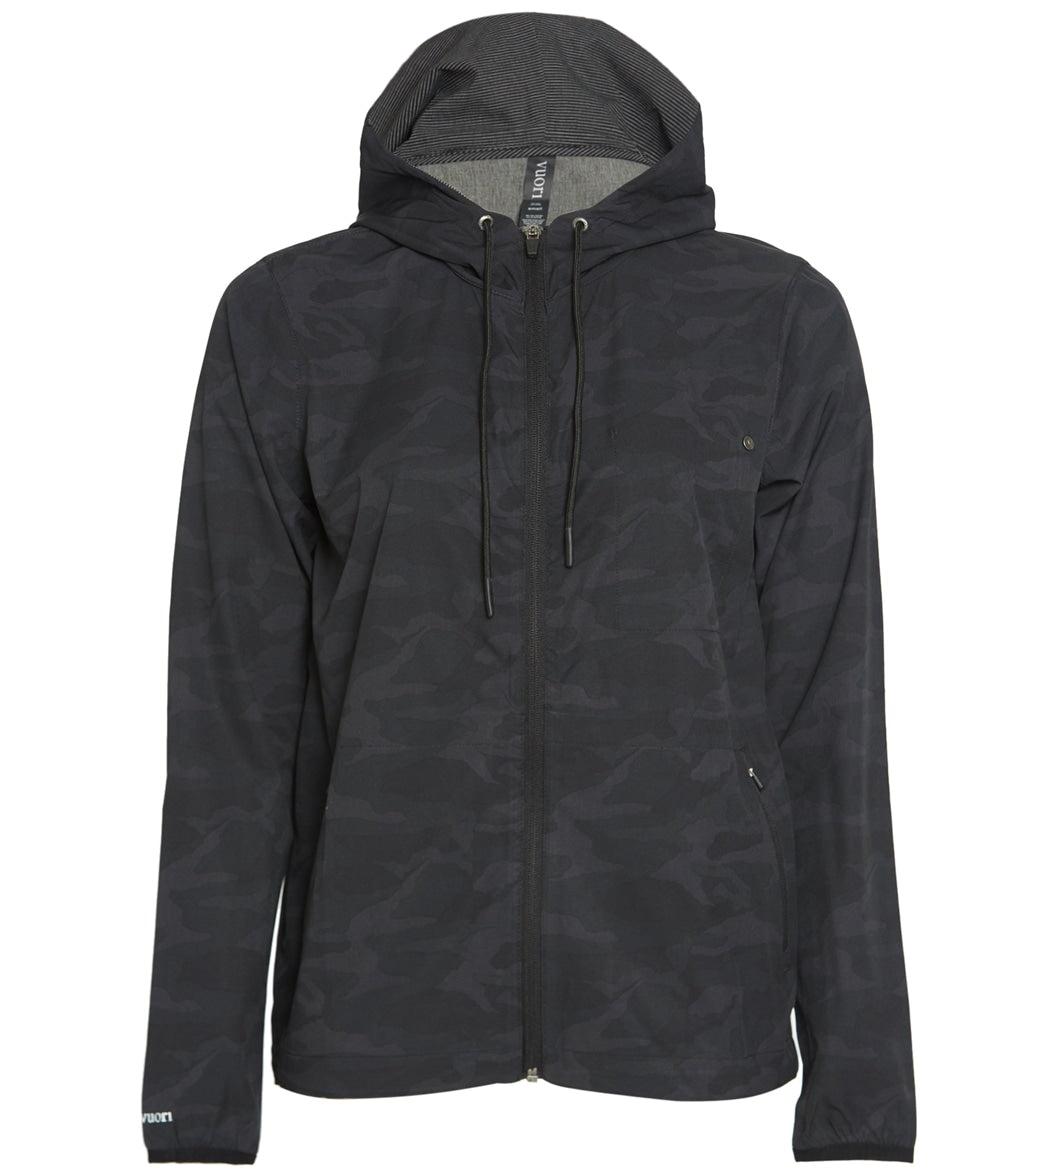 Vuori Women's Outdoor Trainer Shell - Camo Black - X-Small Polyester/Elastane Top